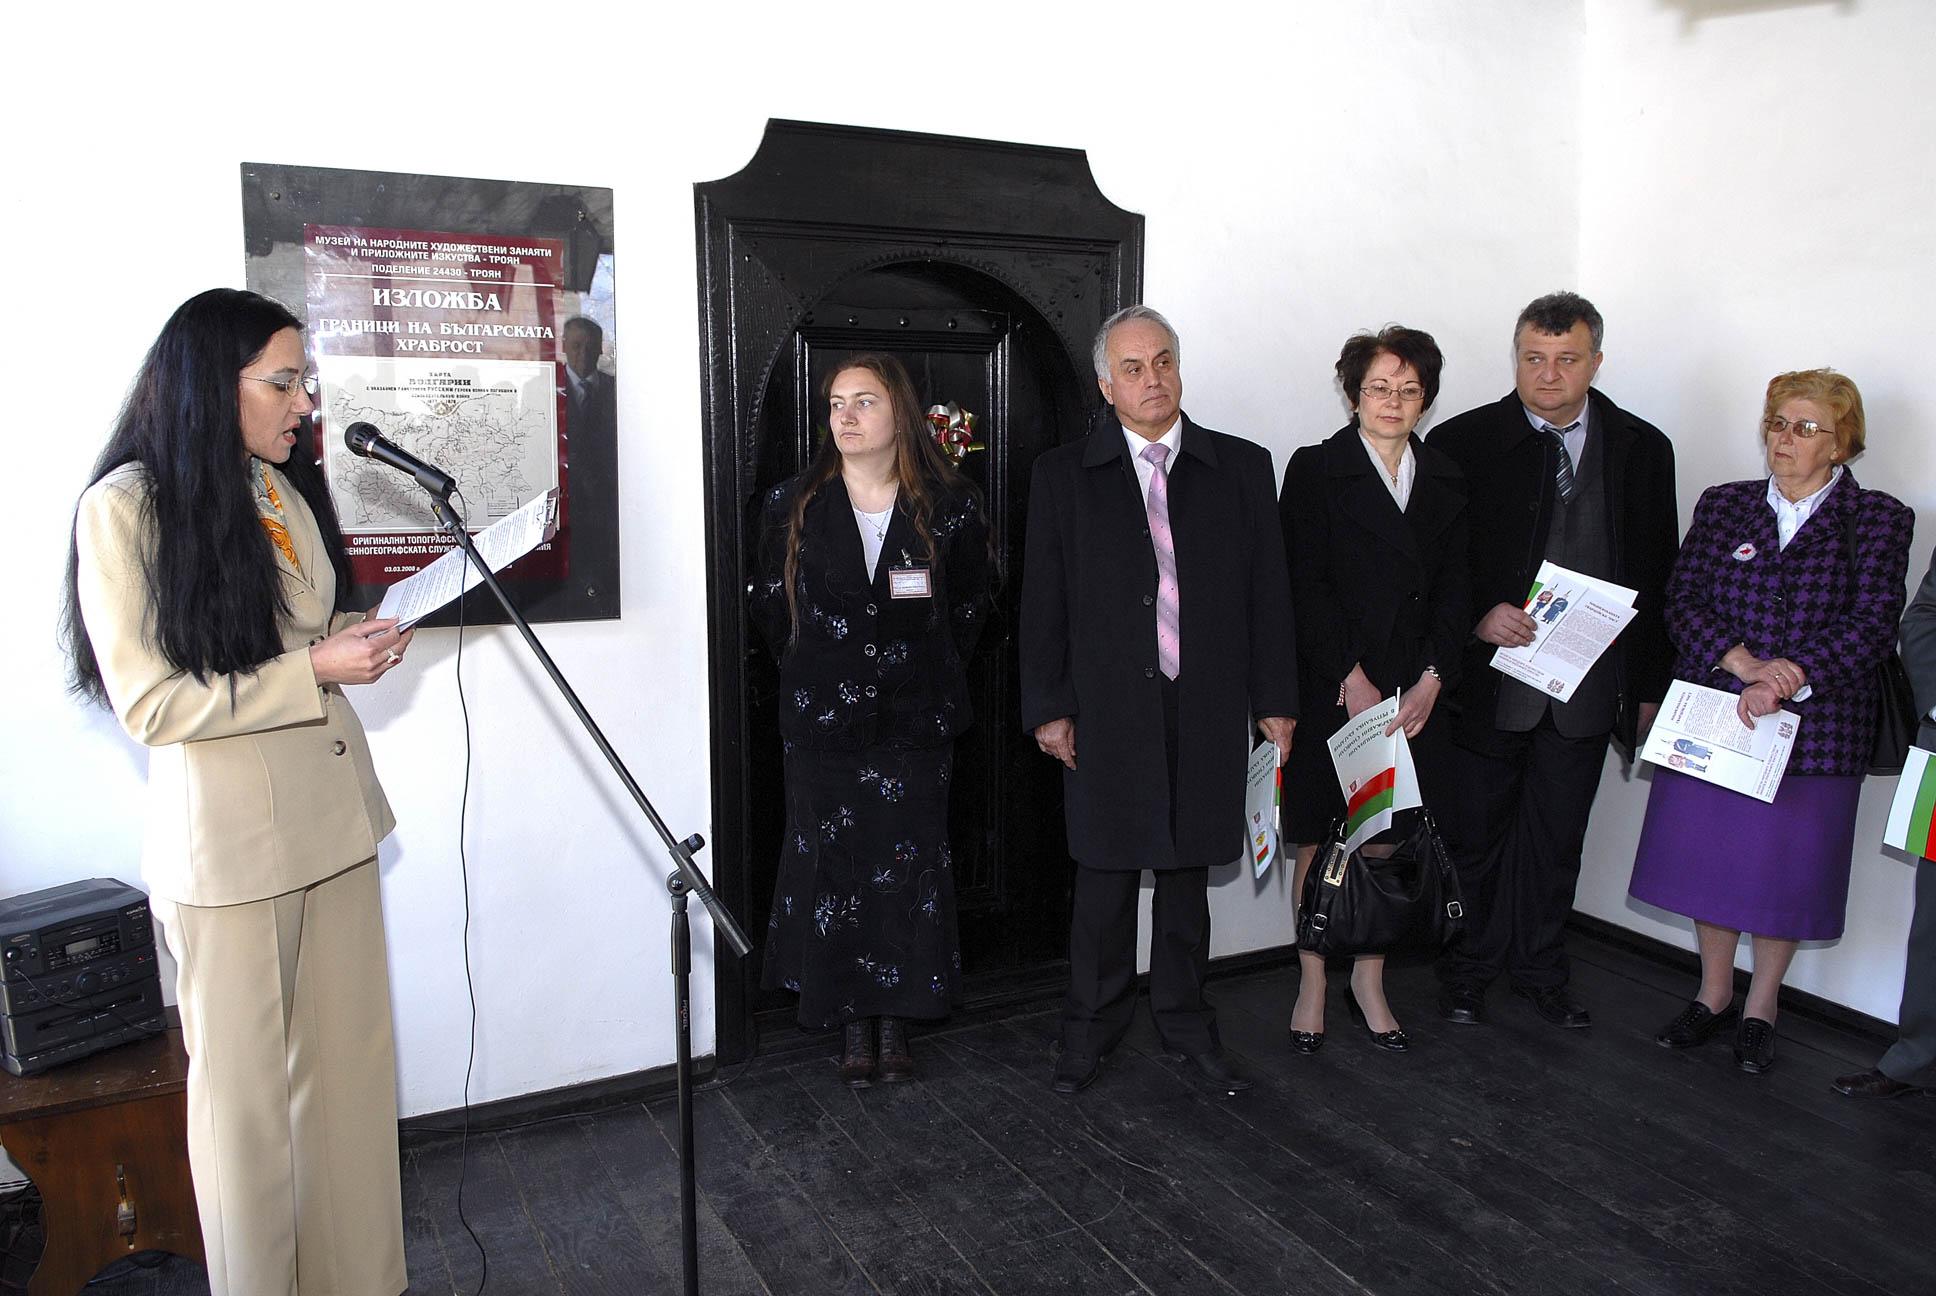 troyan-muzeum-granizi-hrabrost-18